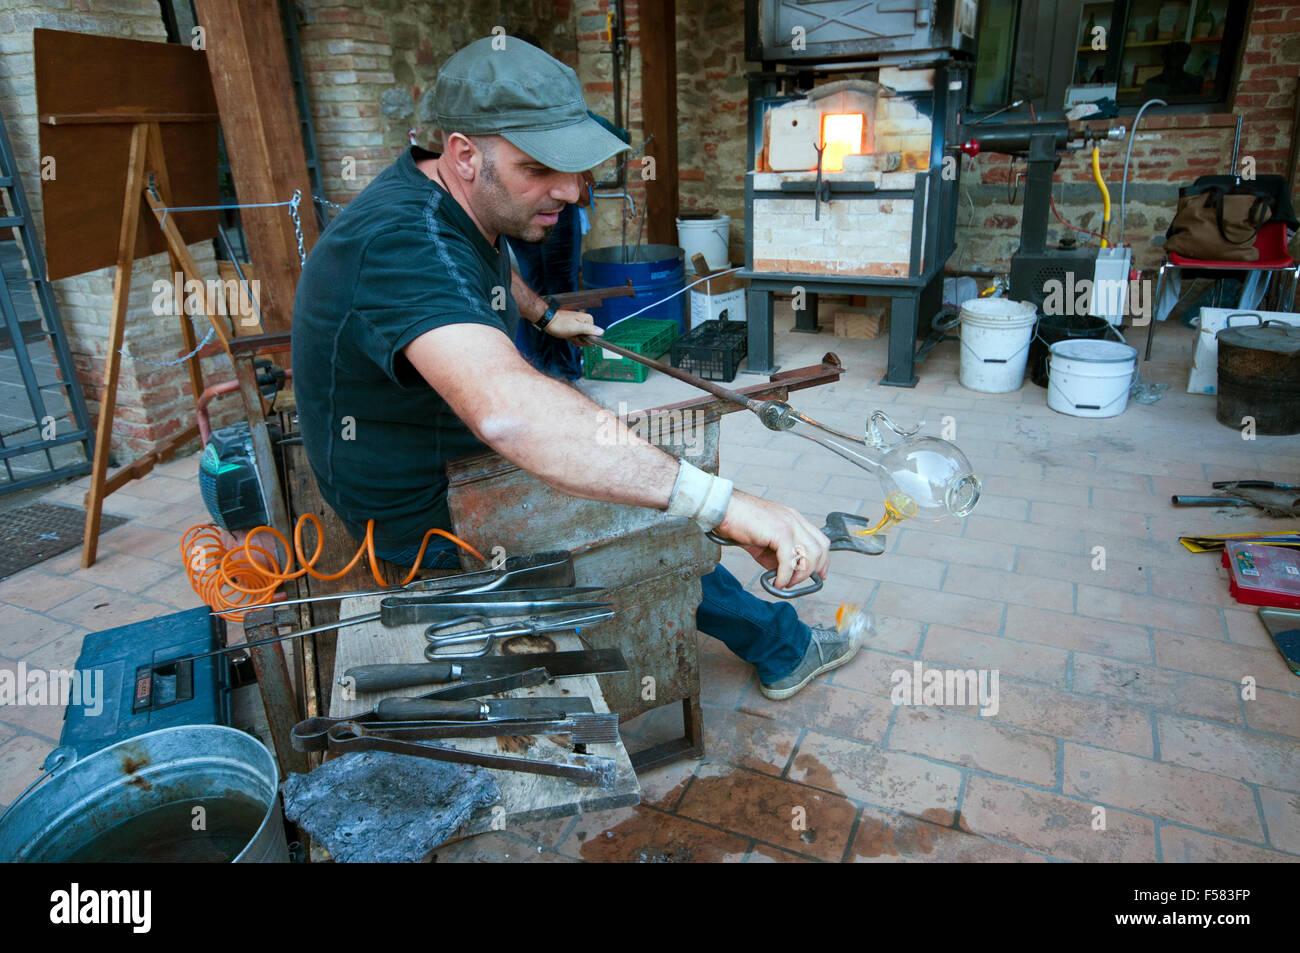 Glass artisan at work in Piegaro, medieval village, Umbria, Italy - Stock Image